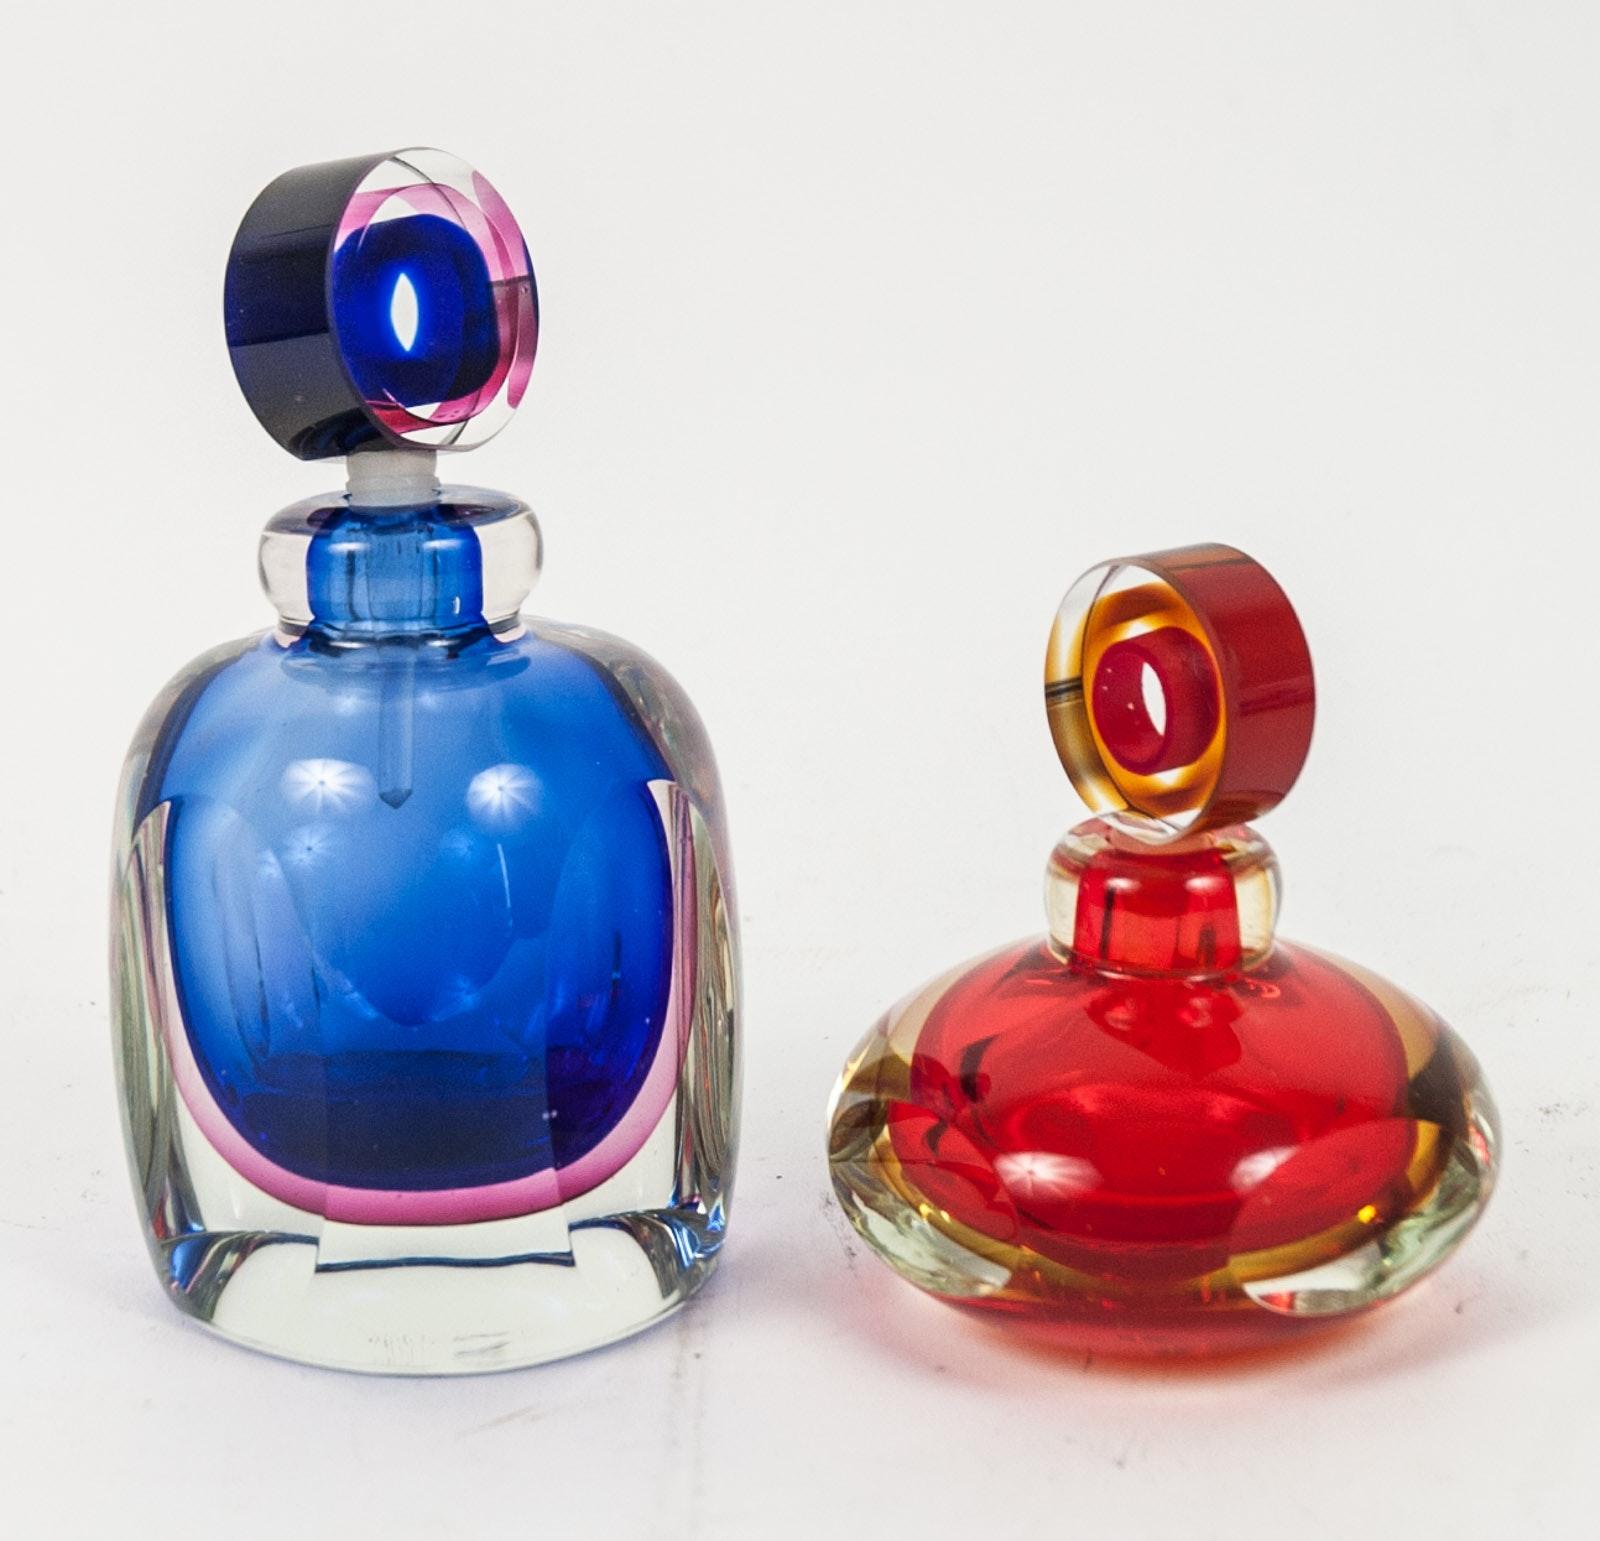 Vintage Glass Perfume Bottles